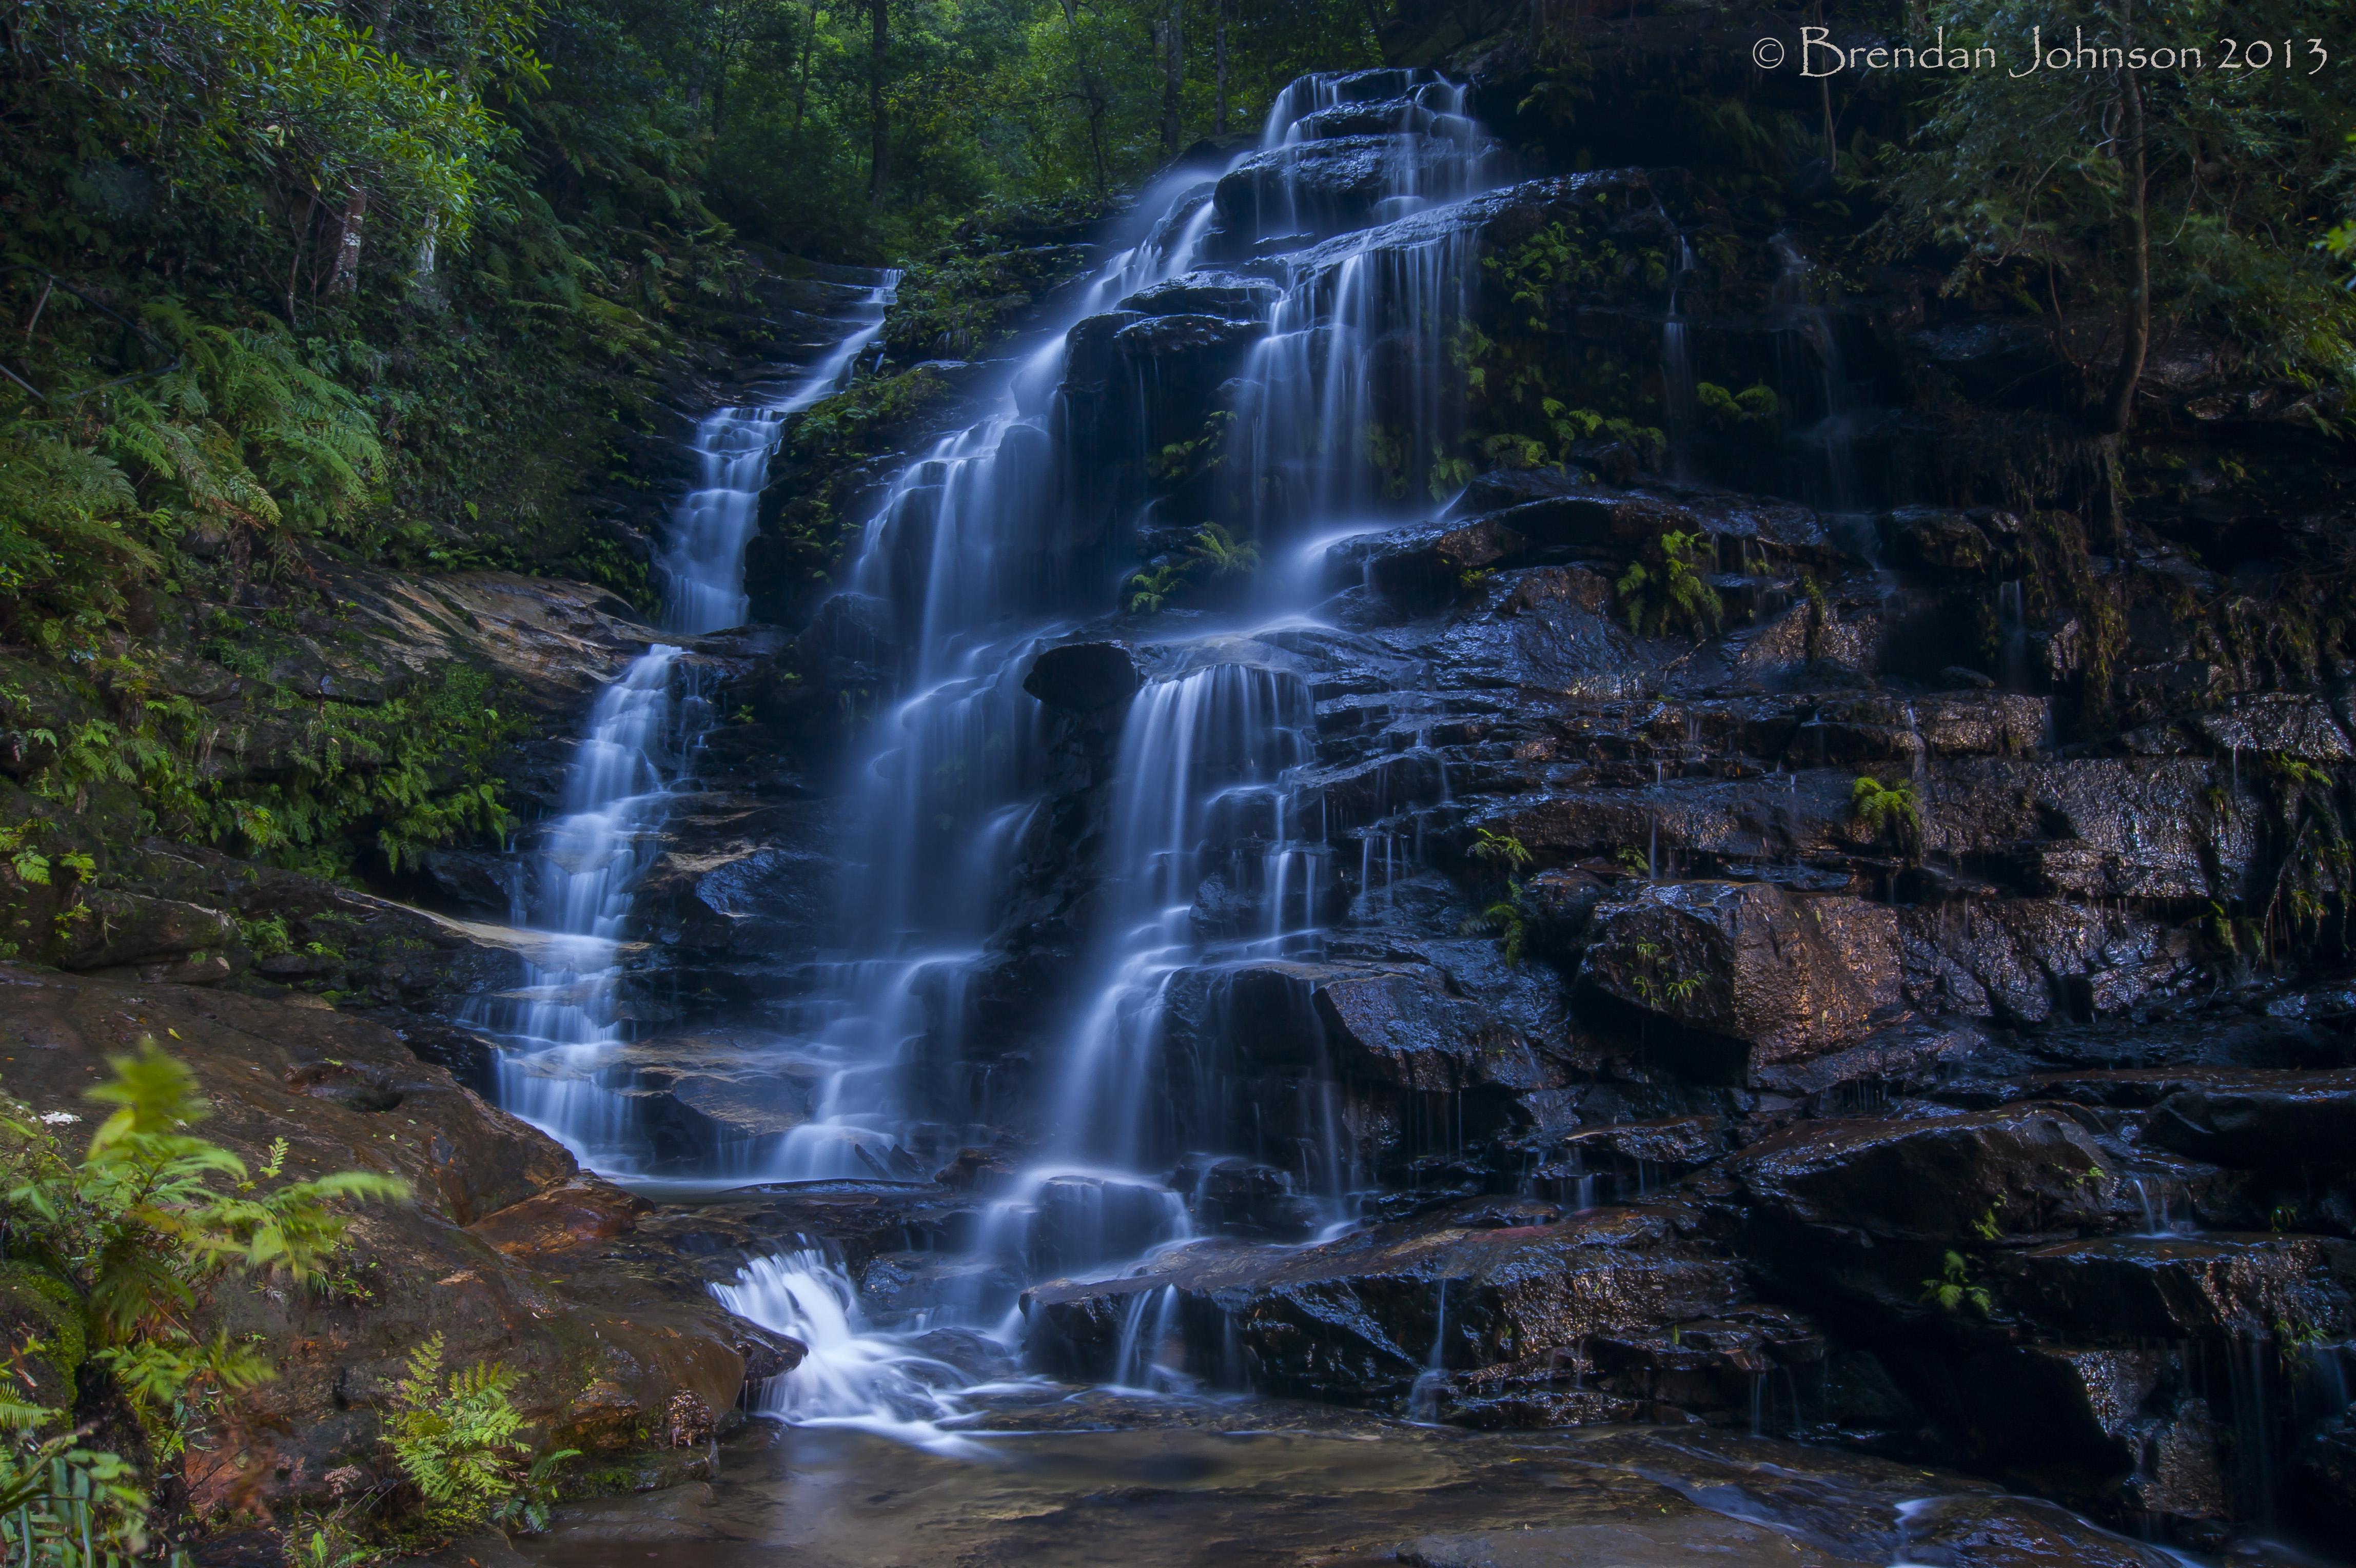 австралия горы водопады виды фото старт обеспечен даже